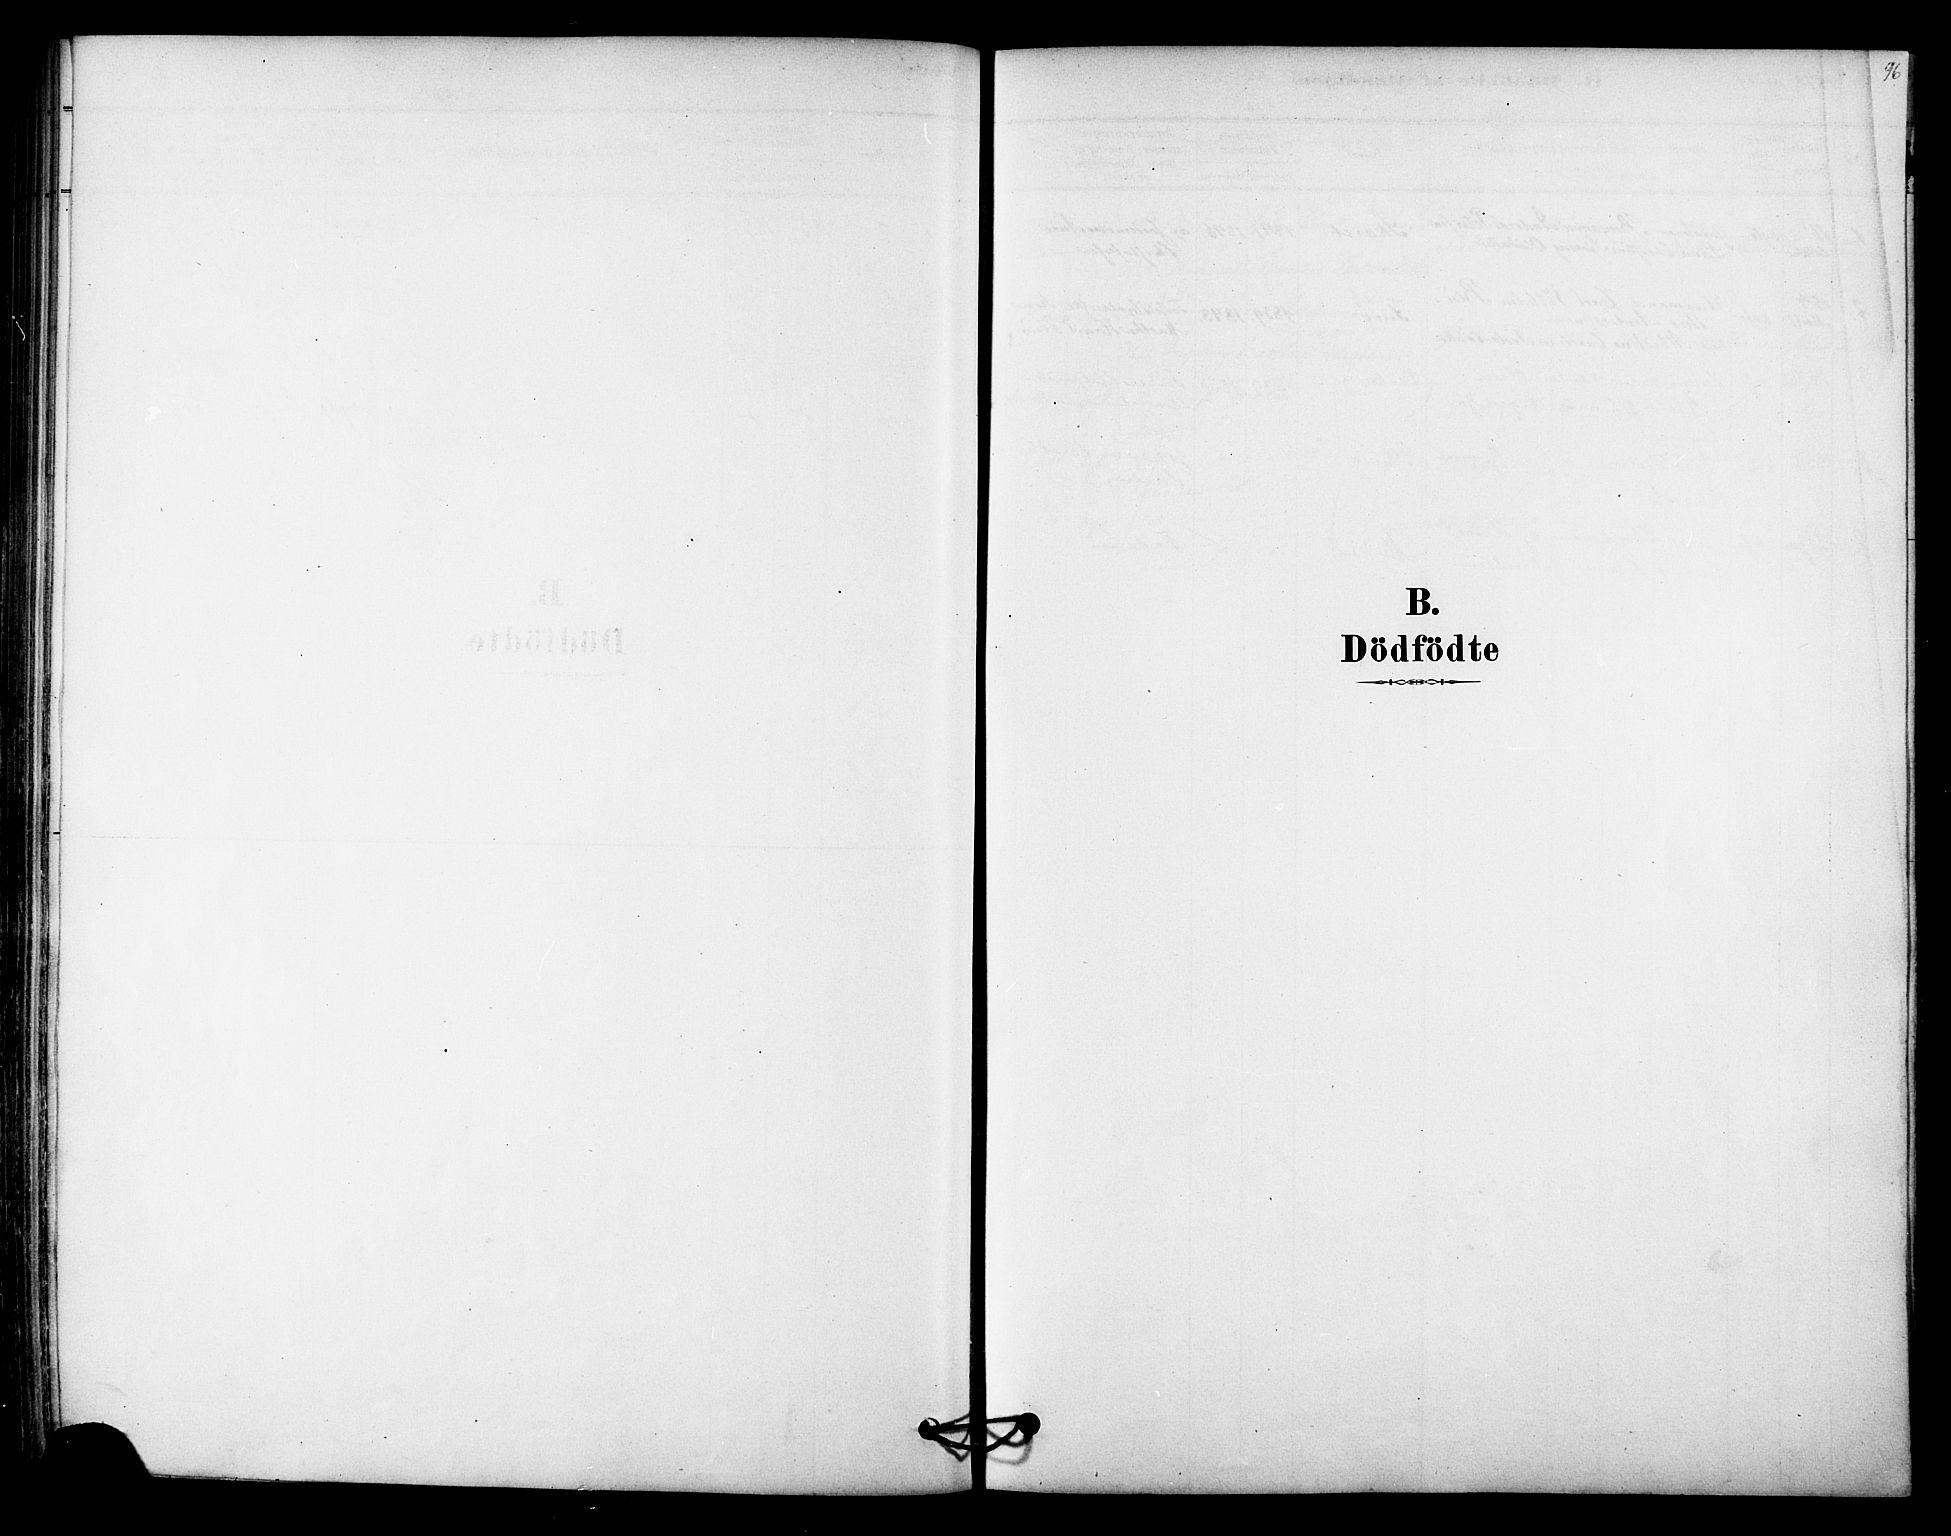 SAT, Ministerialprotokoller, klokkerbøker og fødselsregistre - Nordland, 843/L0626: Ministerialbok nr. 843A01, 1878-1907, s. 96